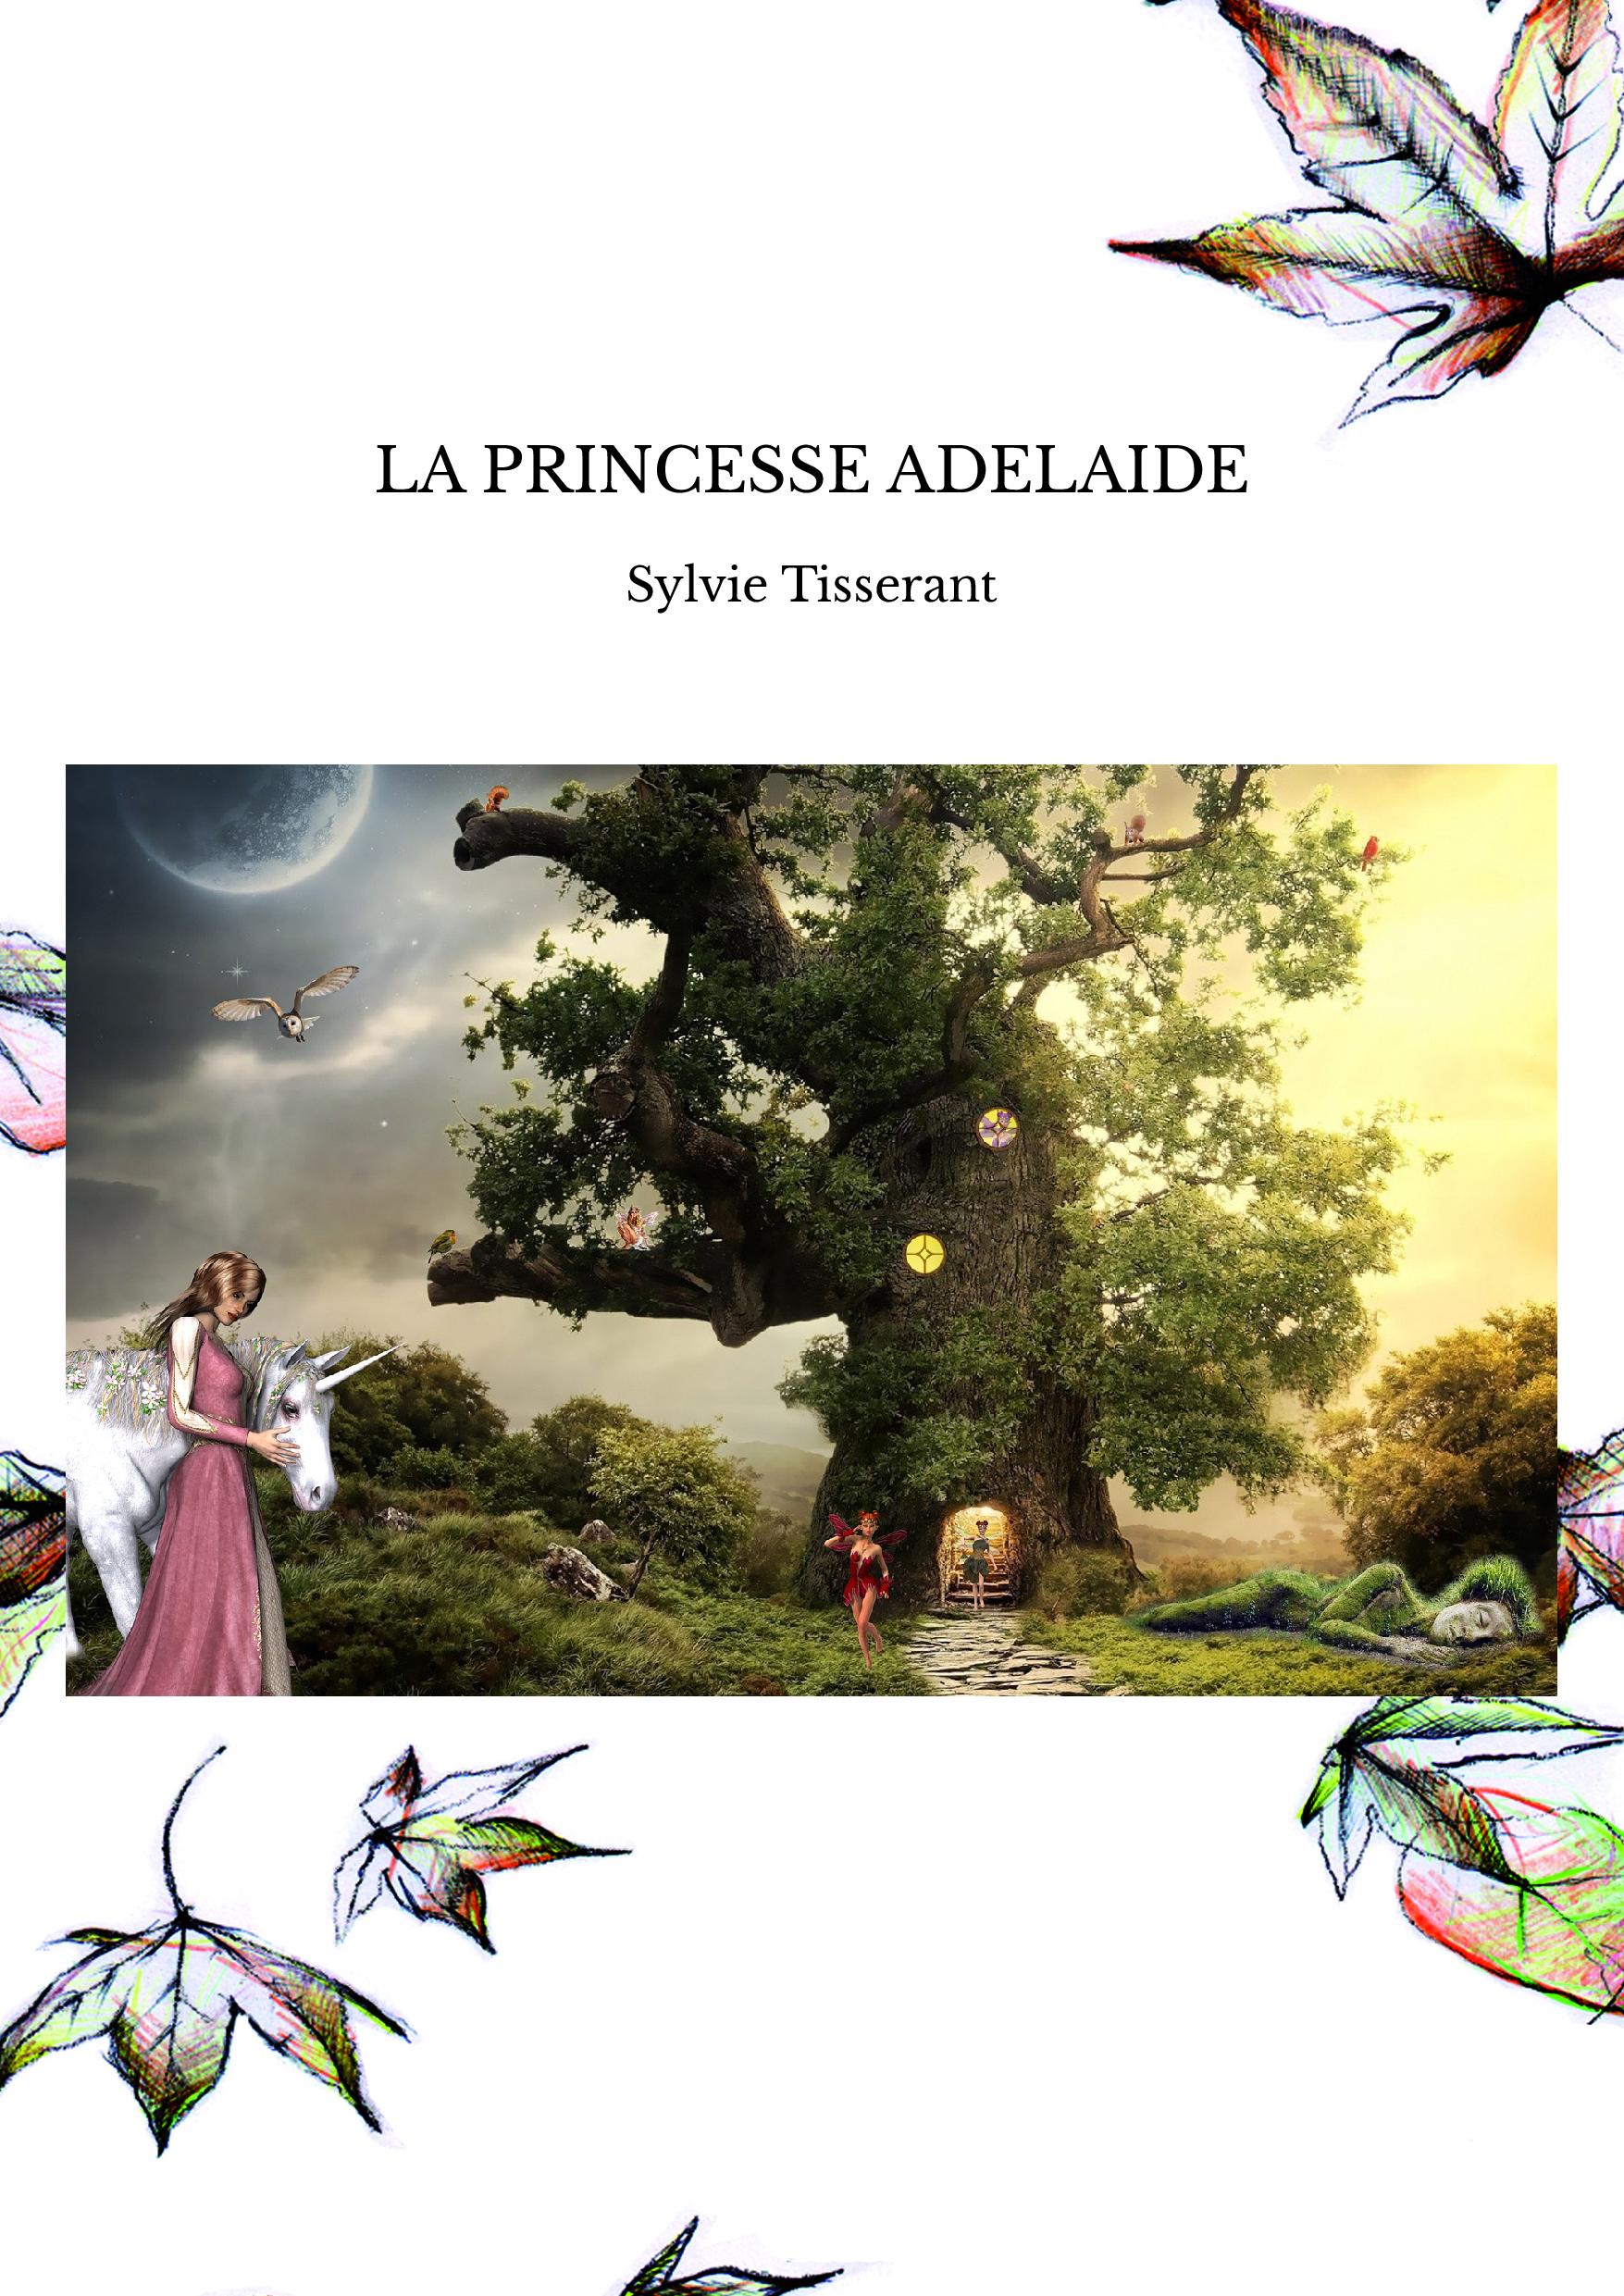 LA PRINCESSE ADELAIDE